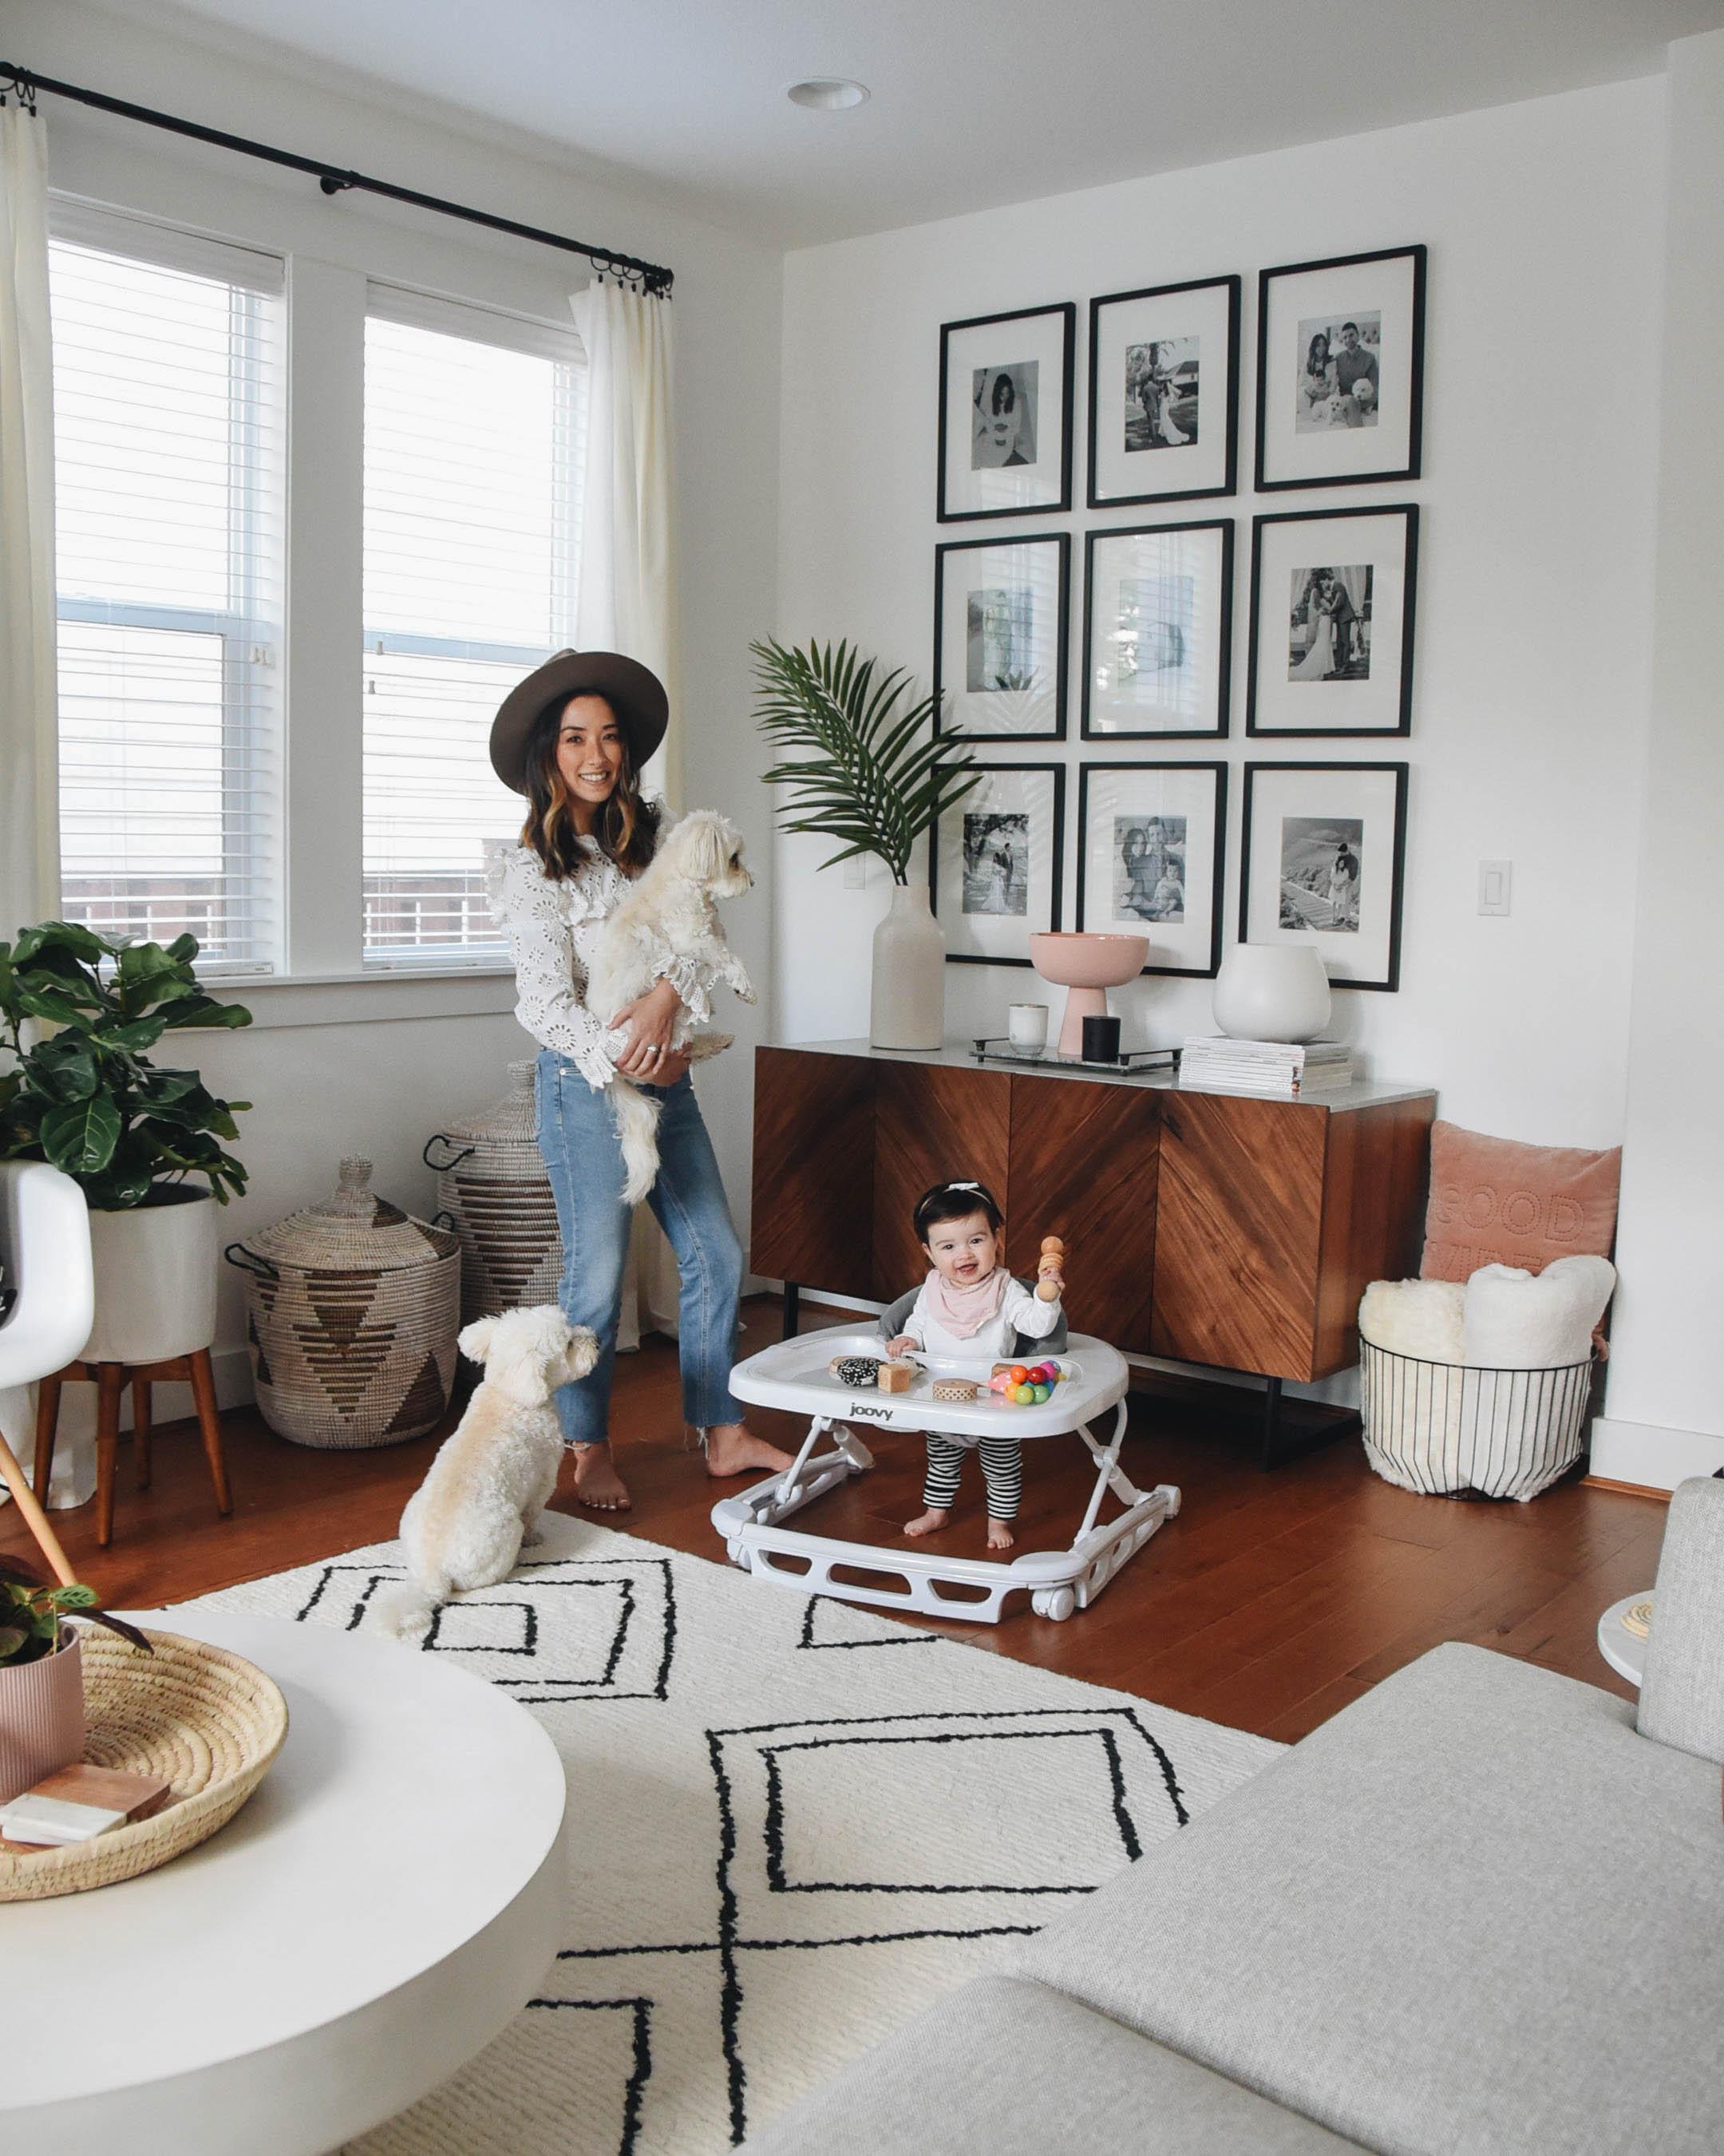 Crystalin Marie living room